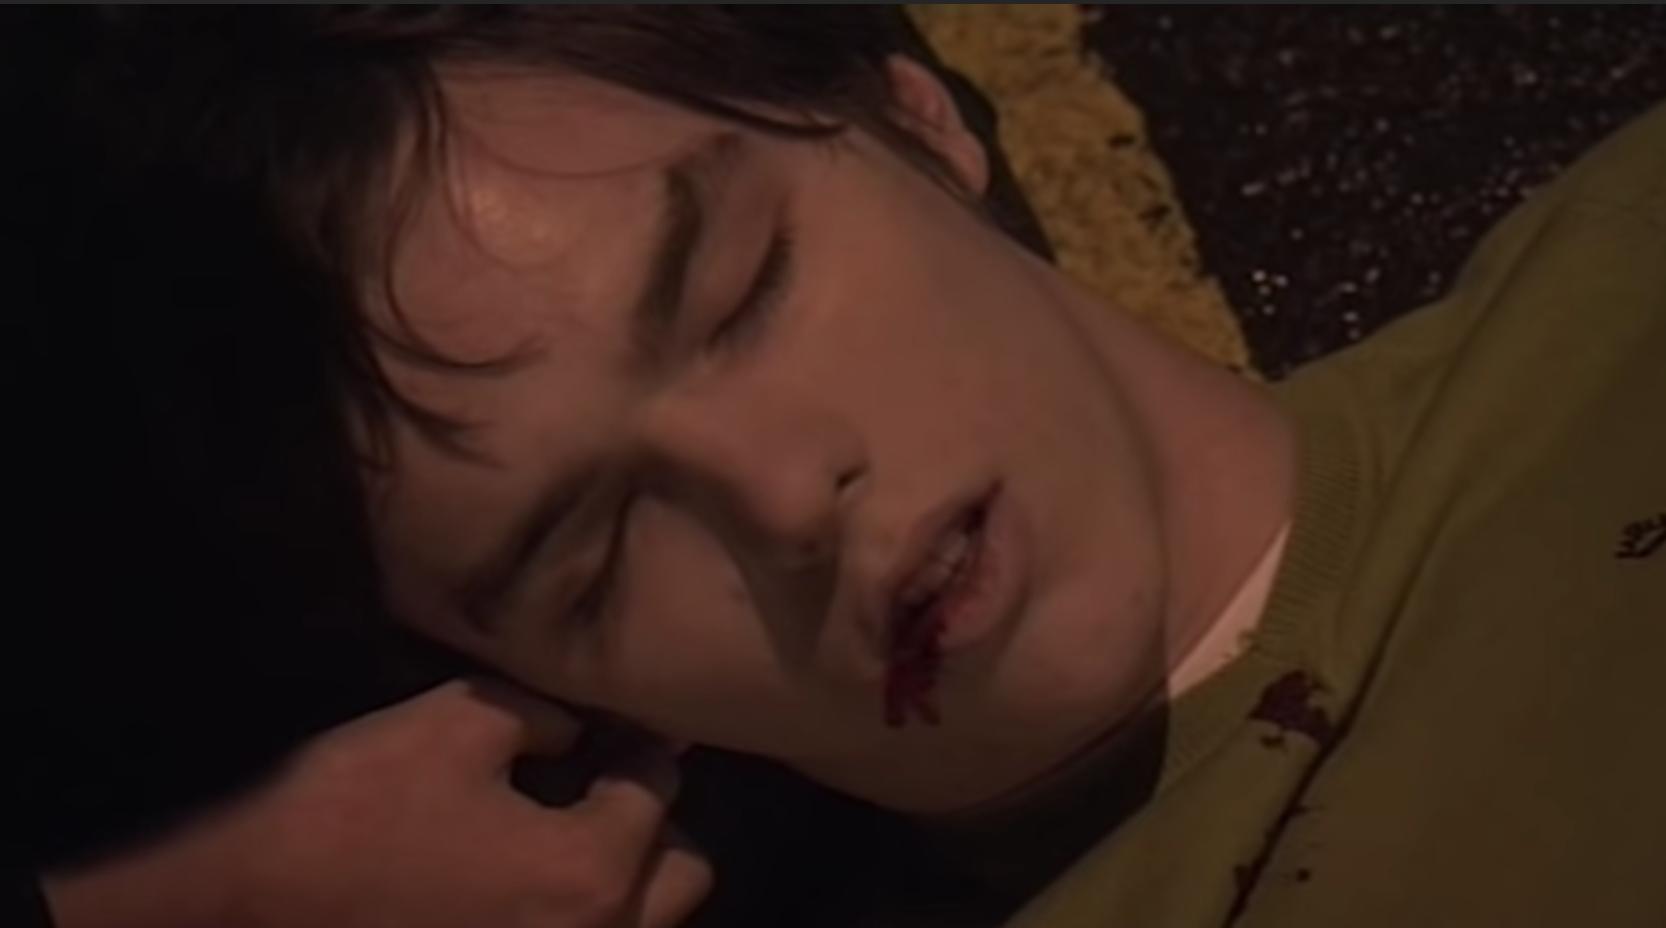 Tony lying on the ground bleeding